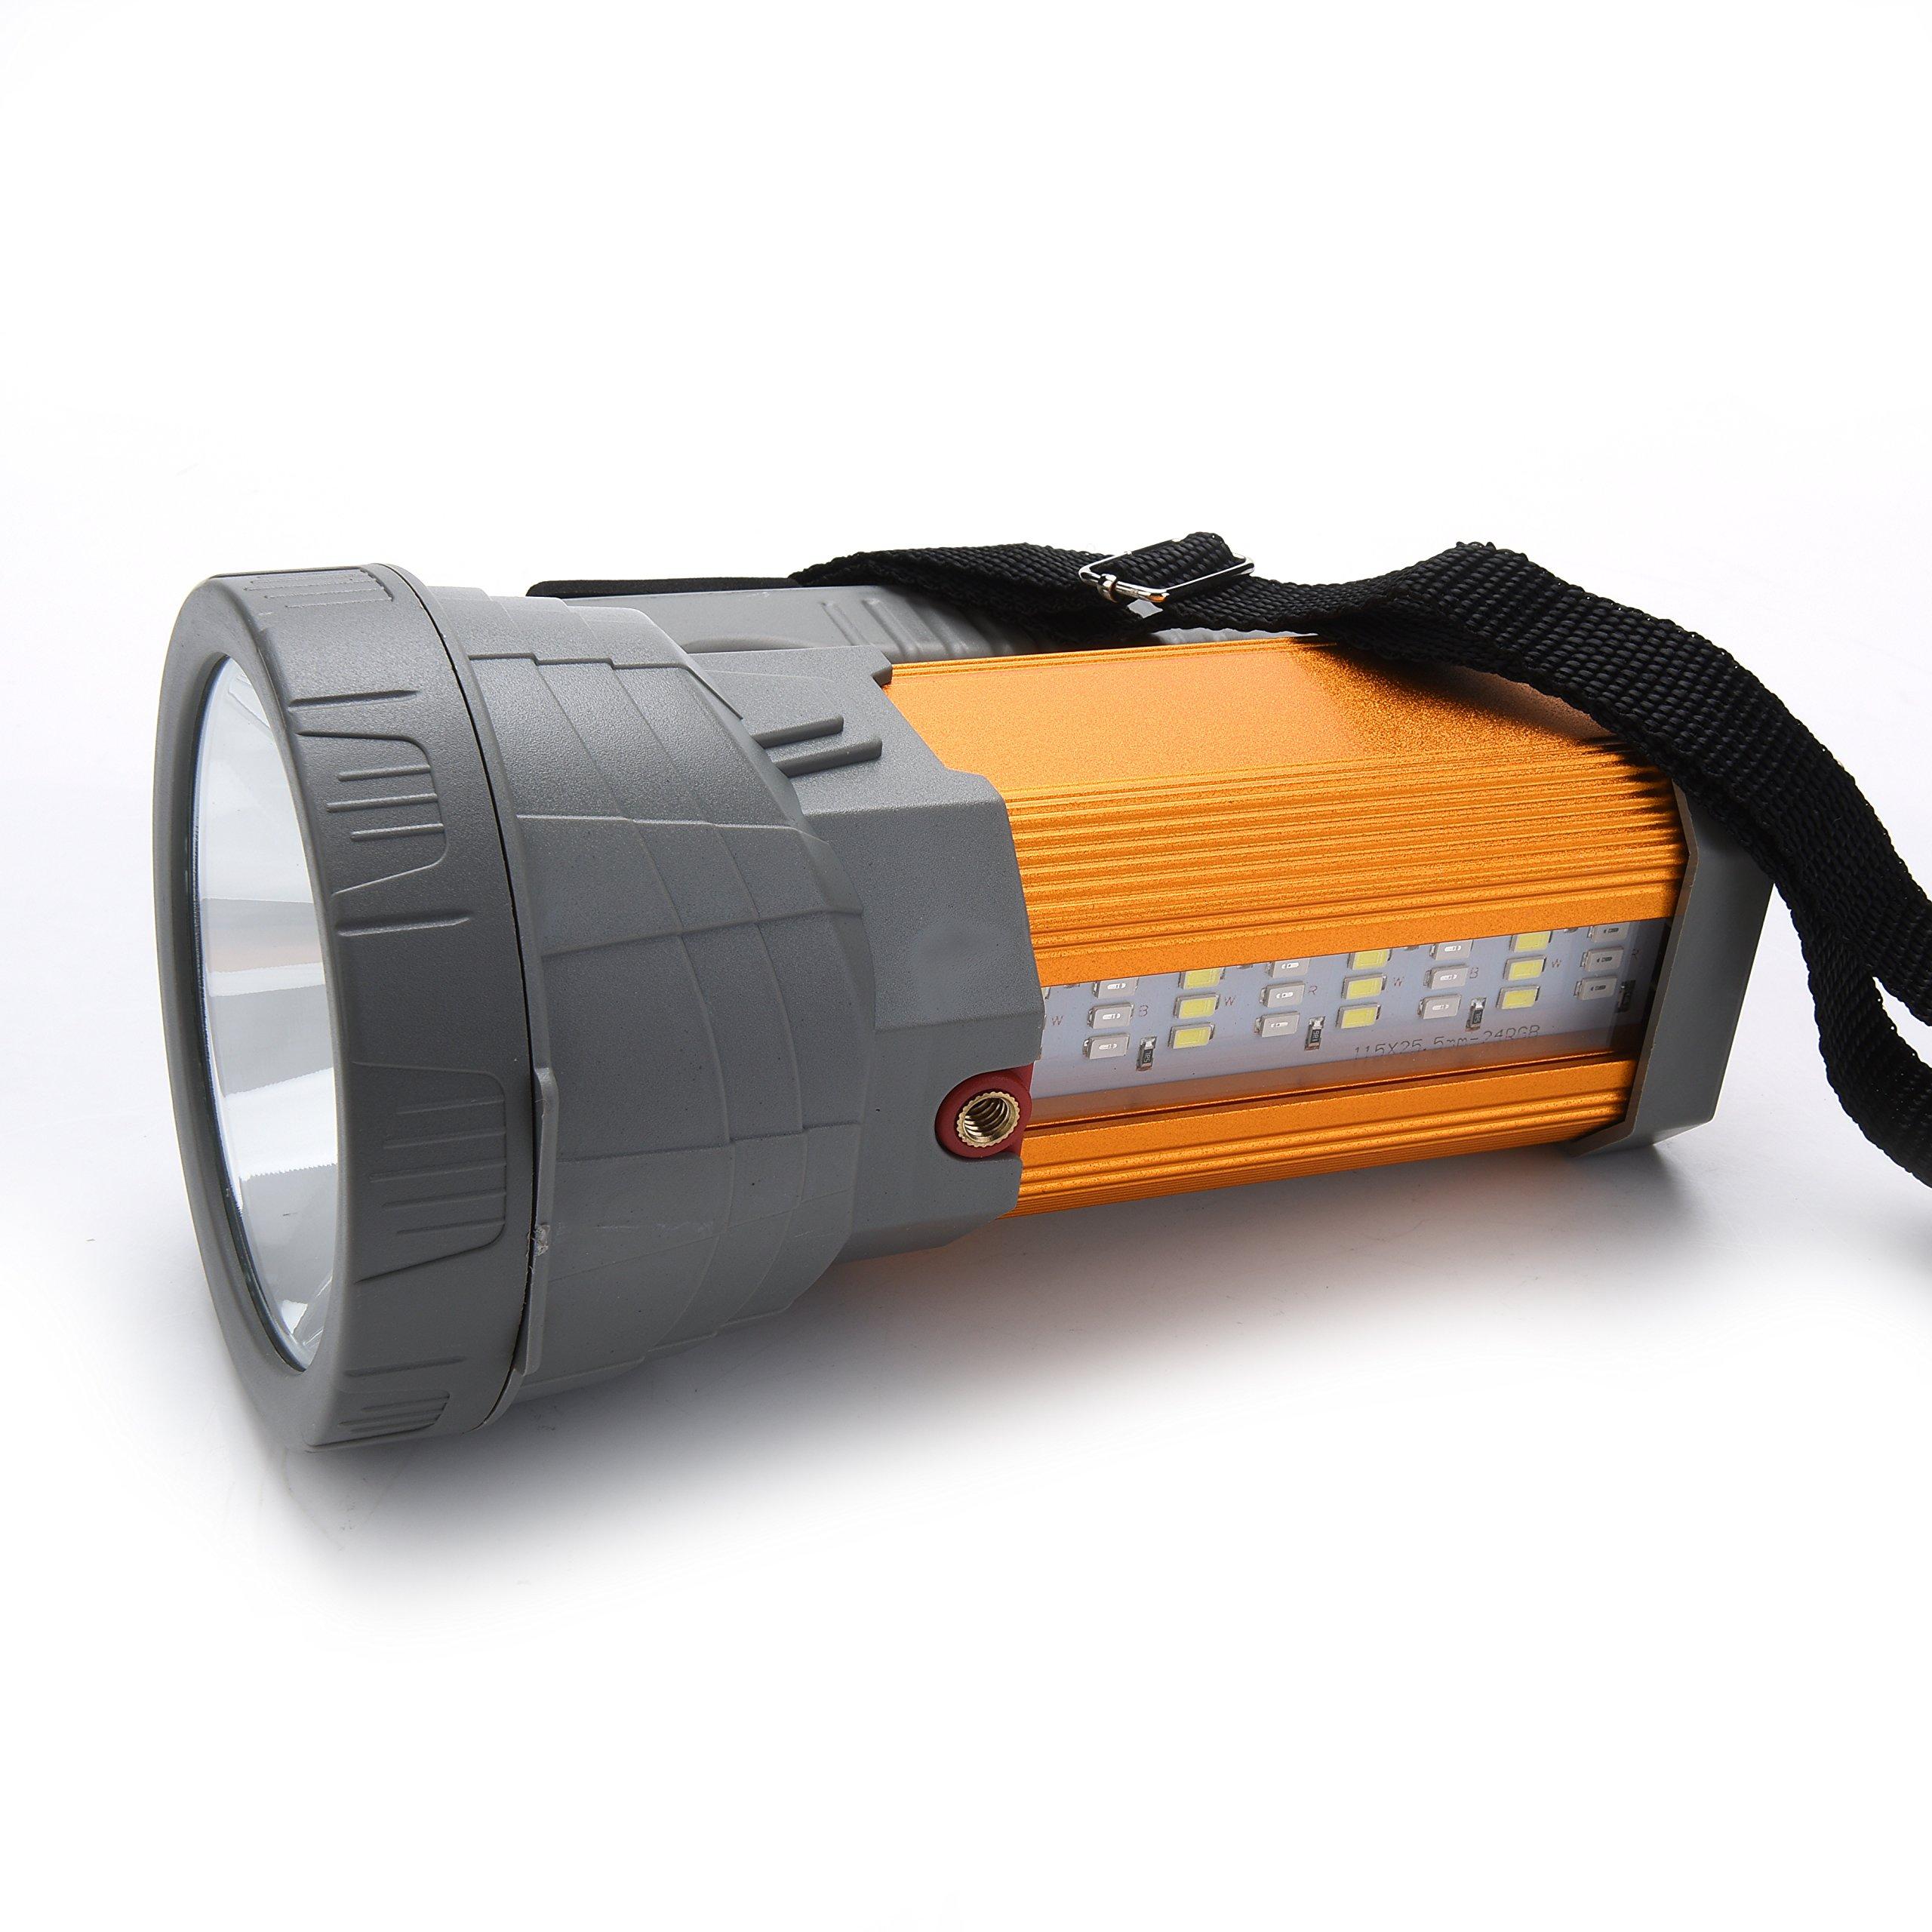 Super Bright Rechargeable LED Spotlight Flashlight High Powered 6000 Lumens CREE Handheld Searchlight Large 18650 Battery 10000mah Long Lasting Waterproof, Side Flood Light Camping Lantern Work Light by GEPROSMA (Image #5)